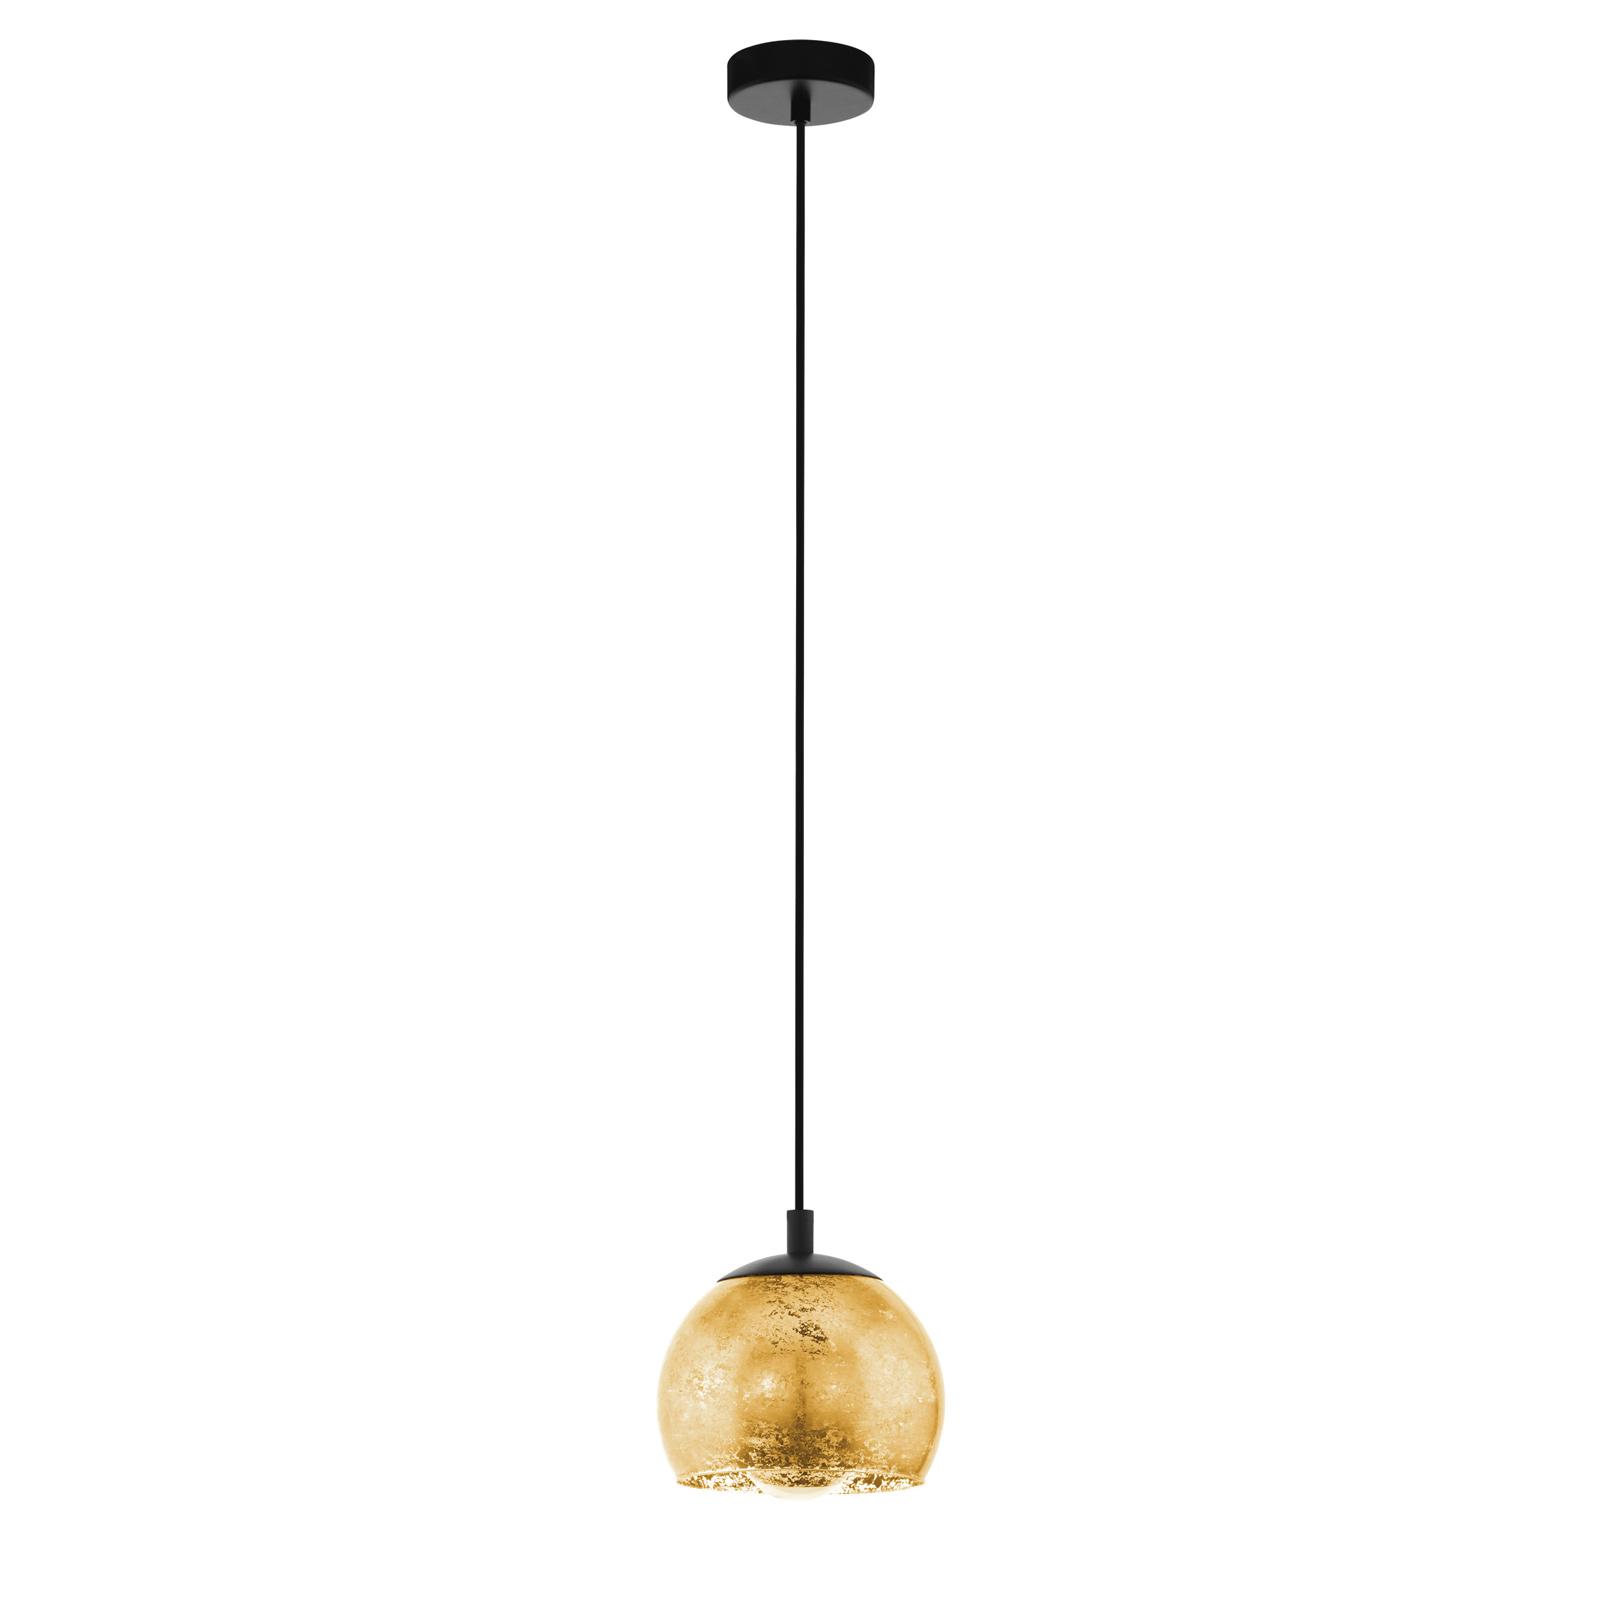 Lampa wisząca Albaraccin 1-punktowa, Ø 19cm